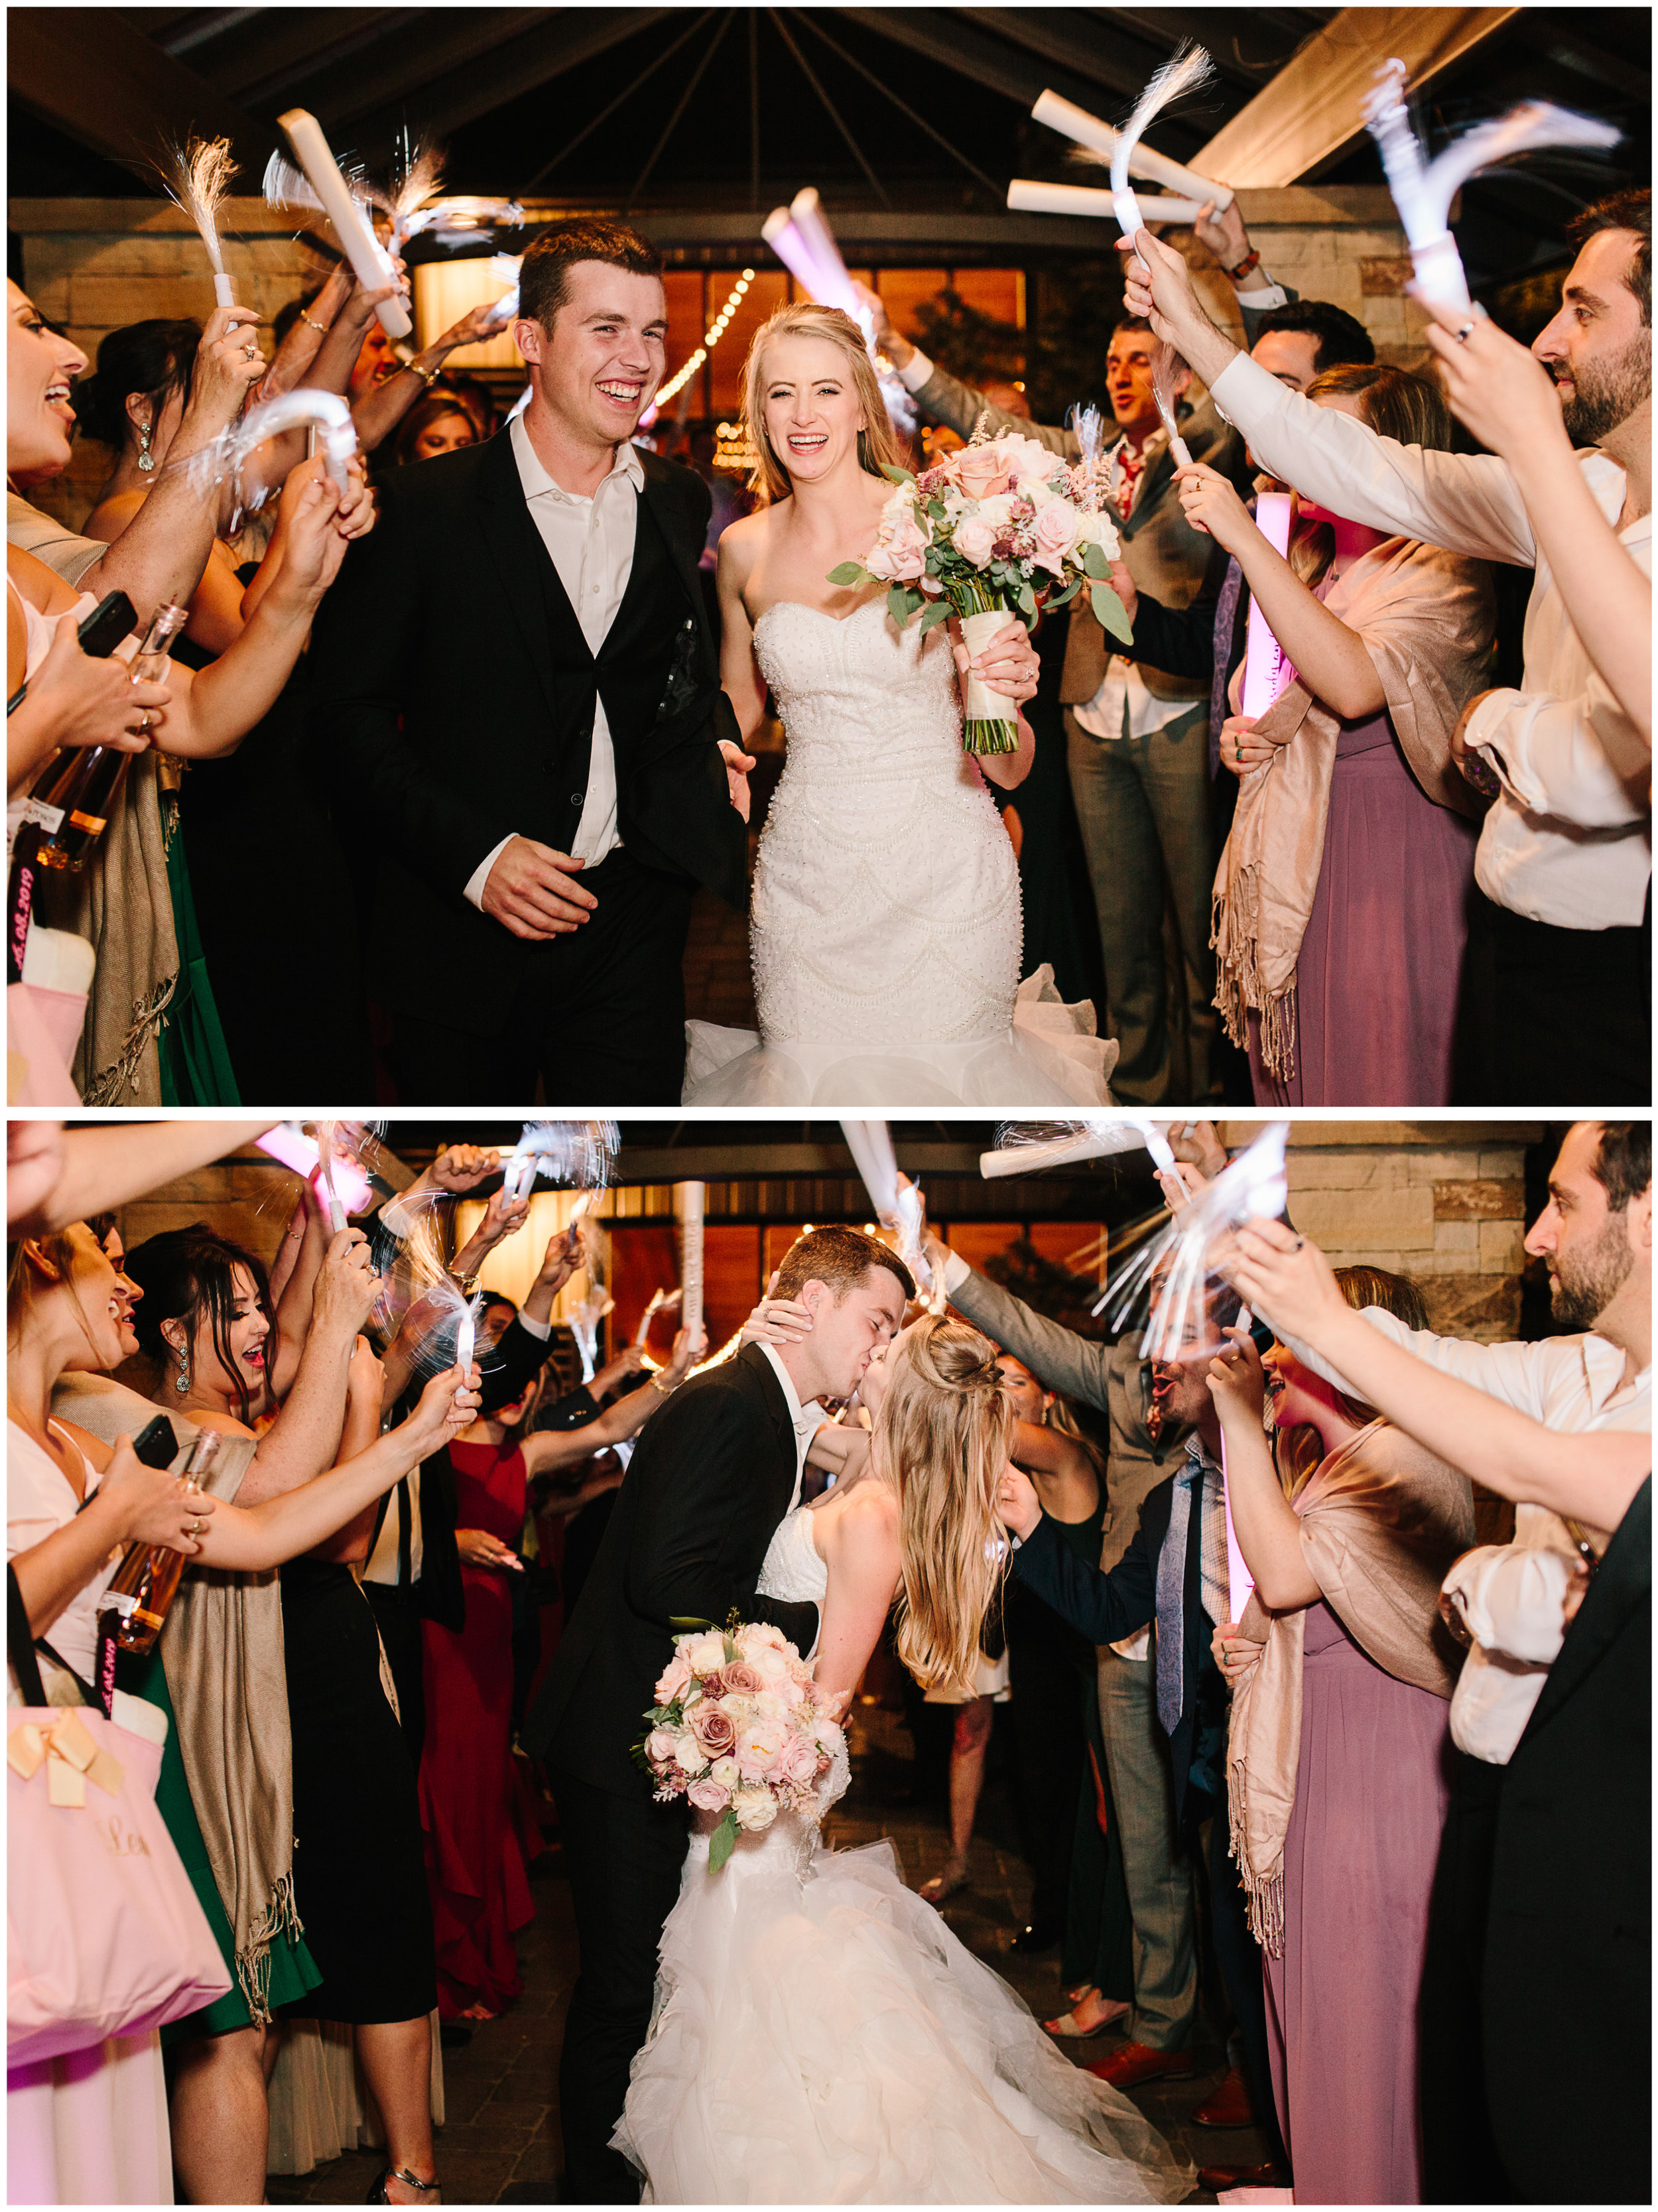 spruce_mountain_ranch_wedding_100.jpg